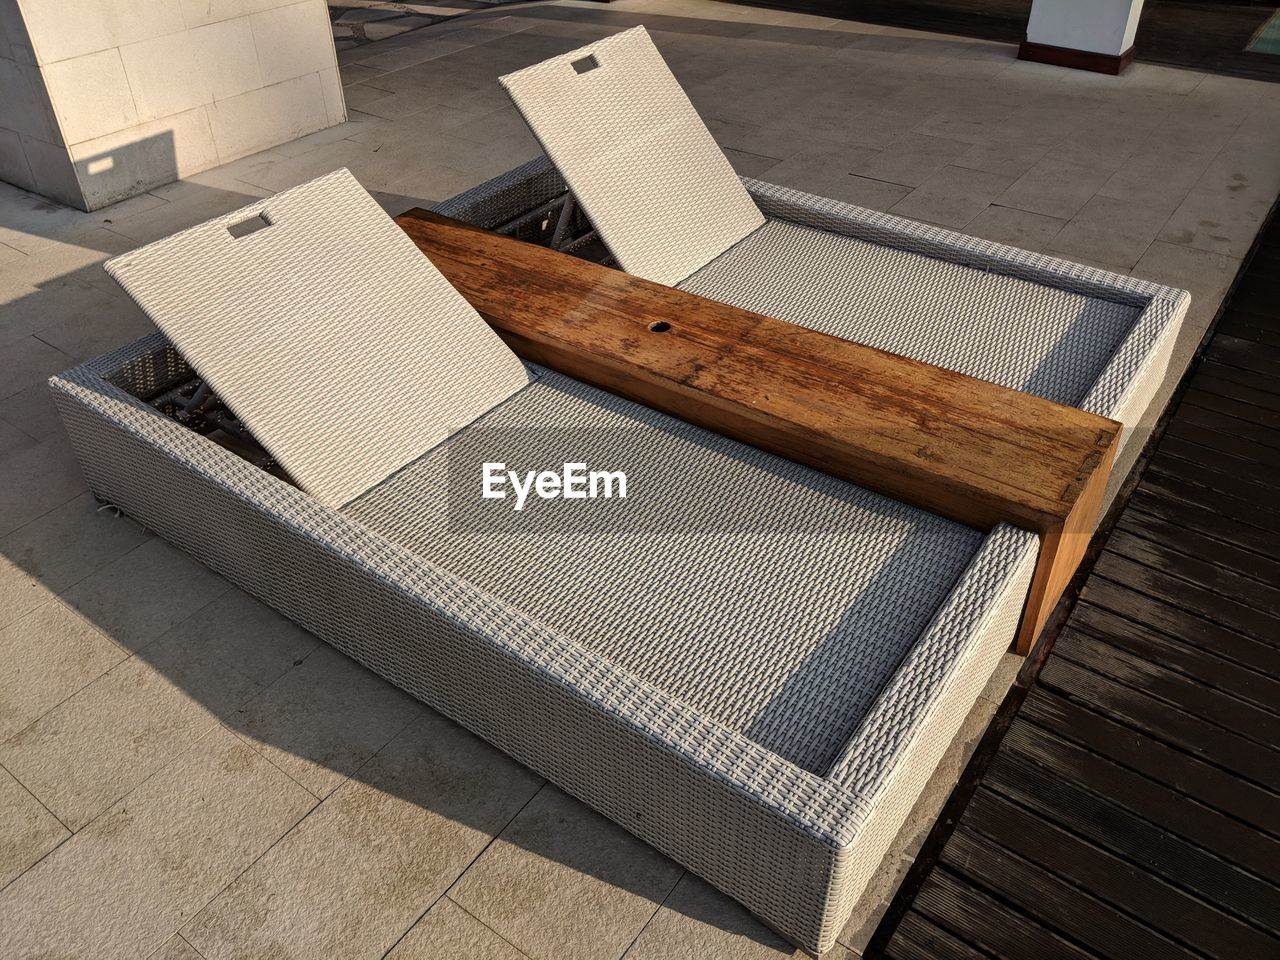 Swimming pool lay down chair